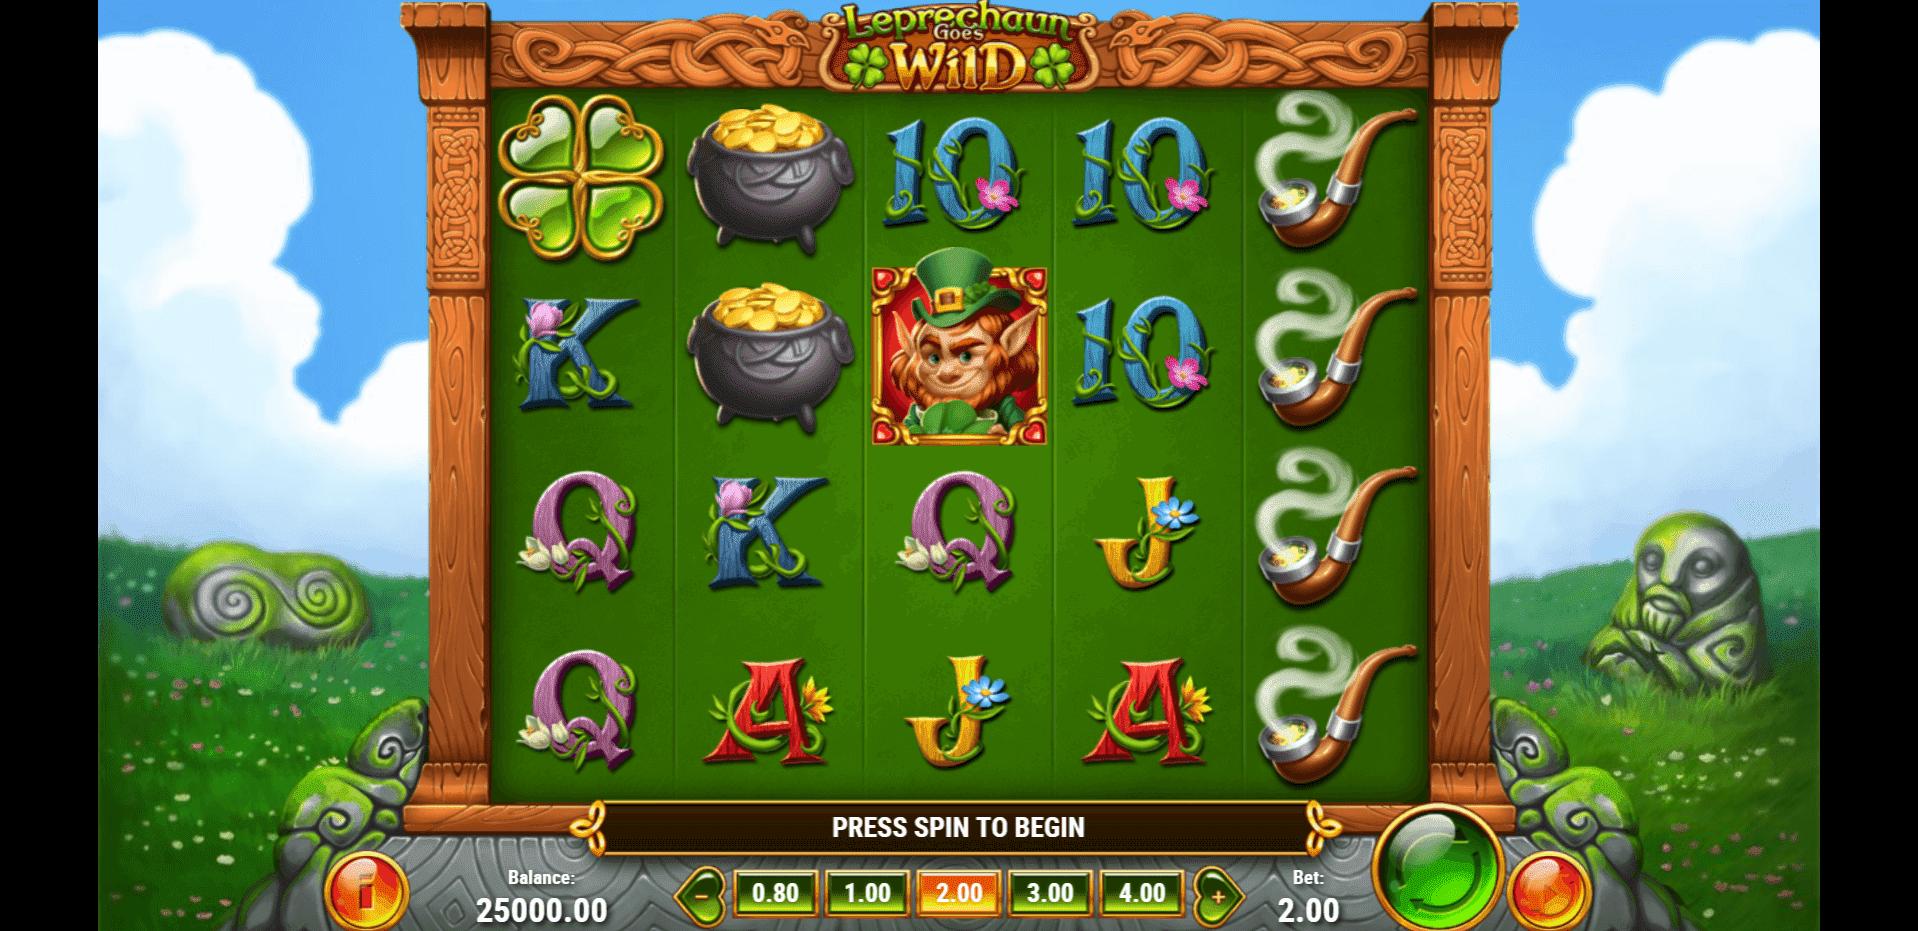 Leprechaun Goes Wild slot machine screenshot